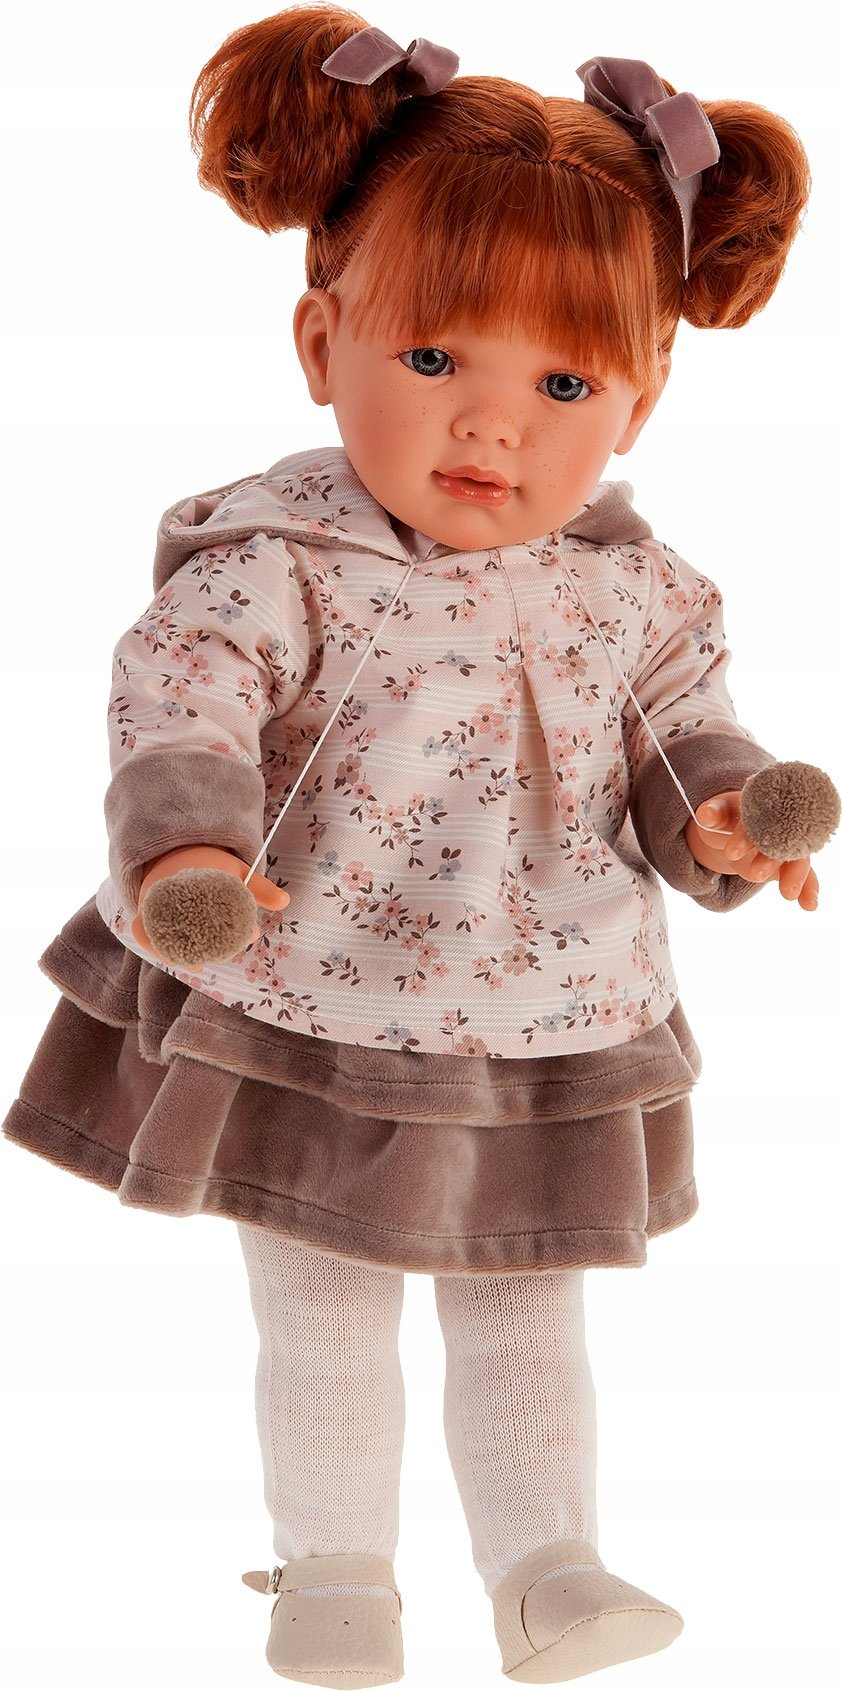 Antonio Juan 1830 - Lula Otono - Duża lalka dziewczynka